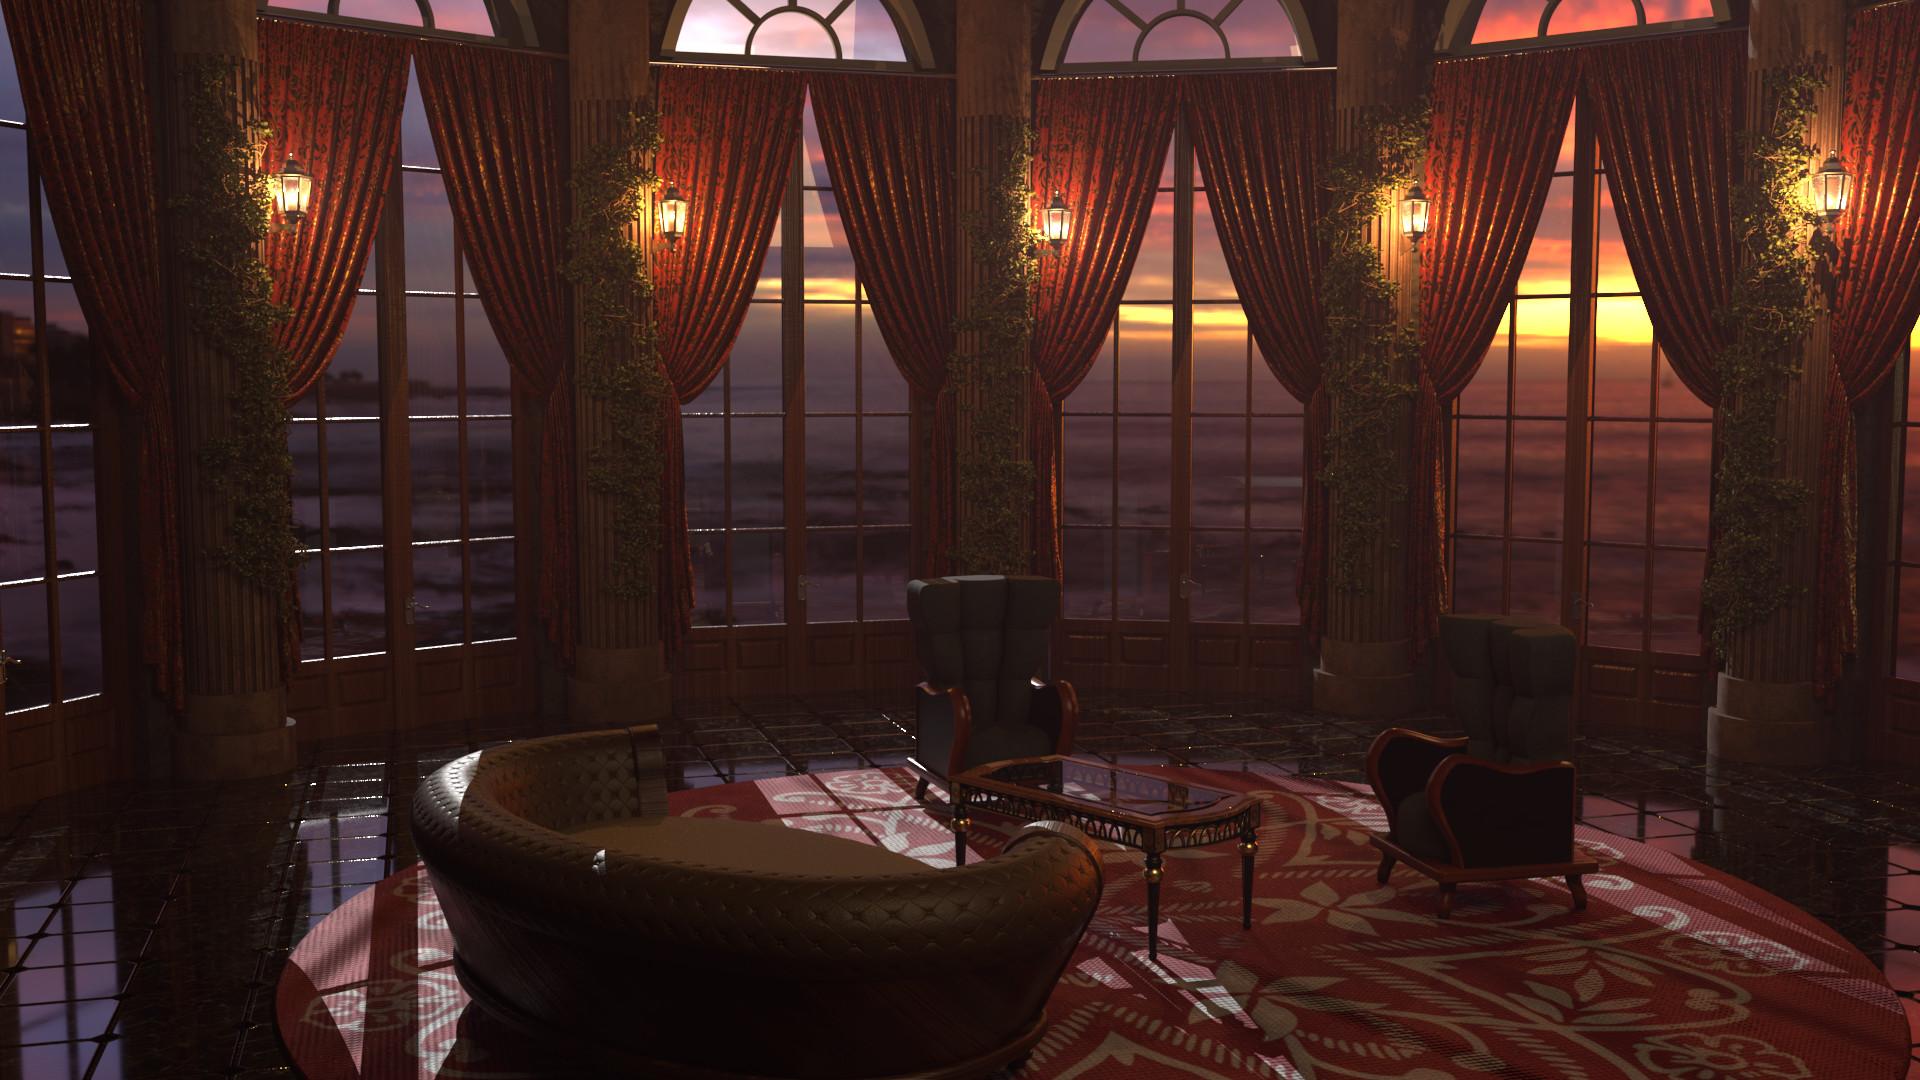 Artstation Luxury Lounge Picard Plaisimond